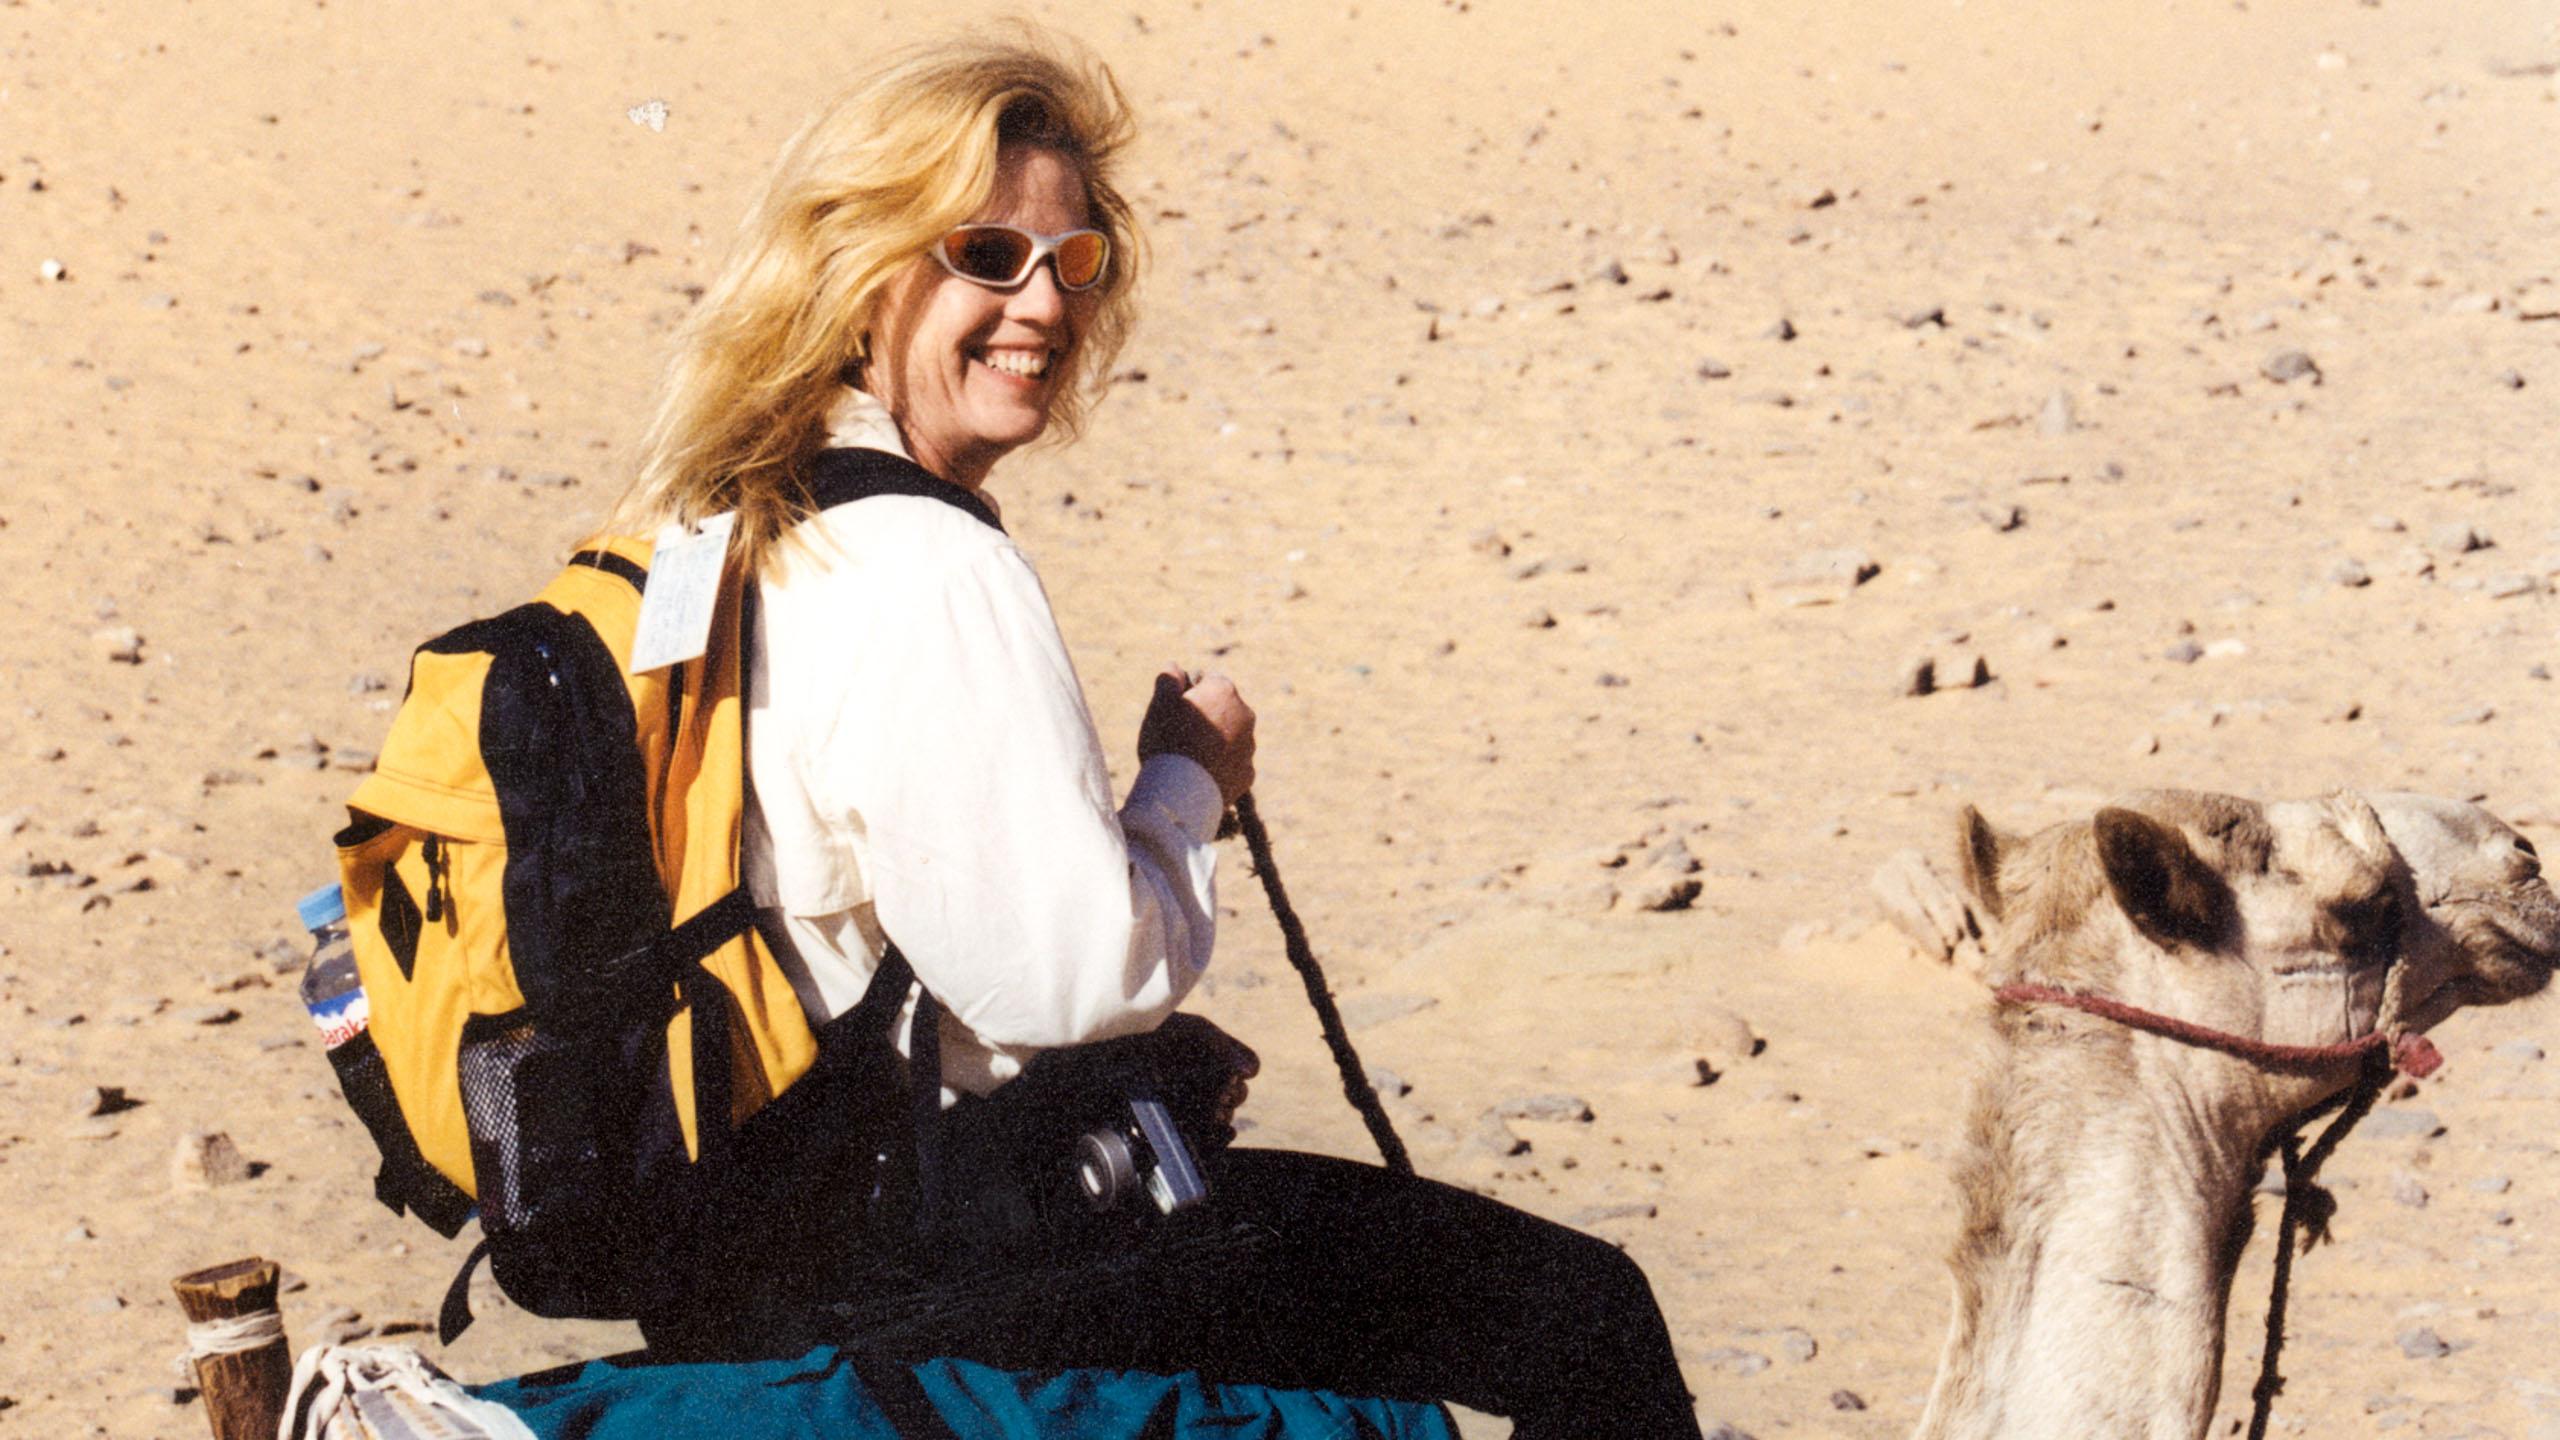 Woman riding camel on Egypt trip